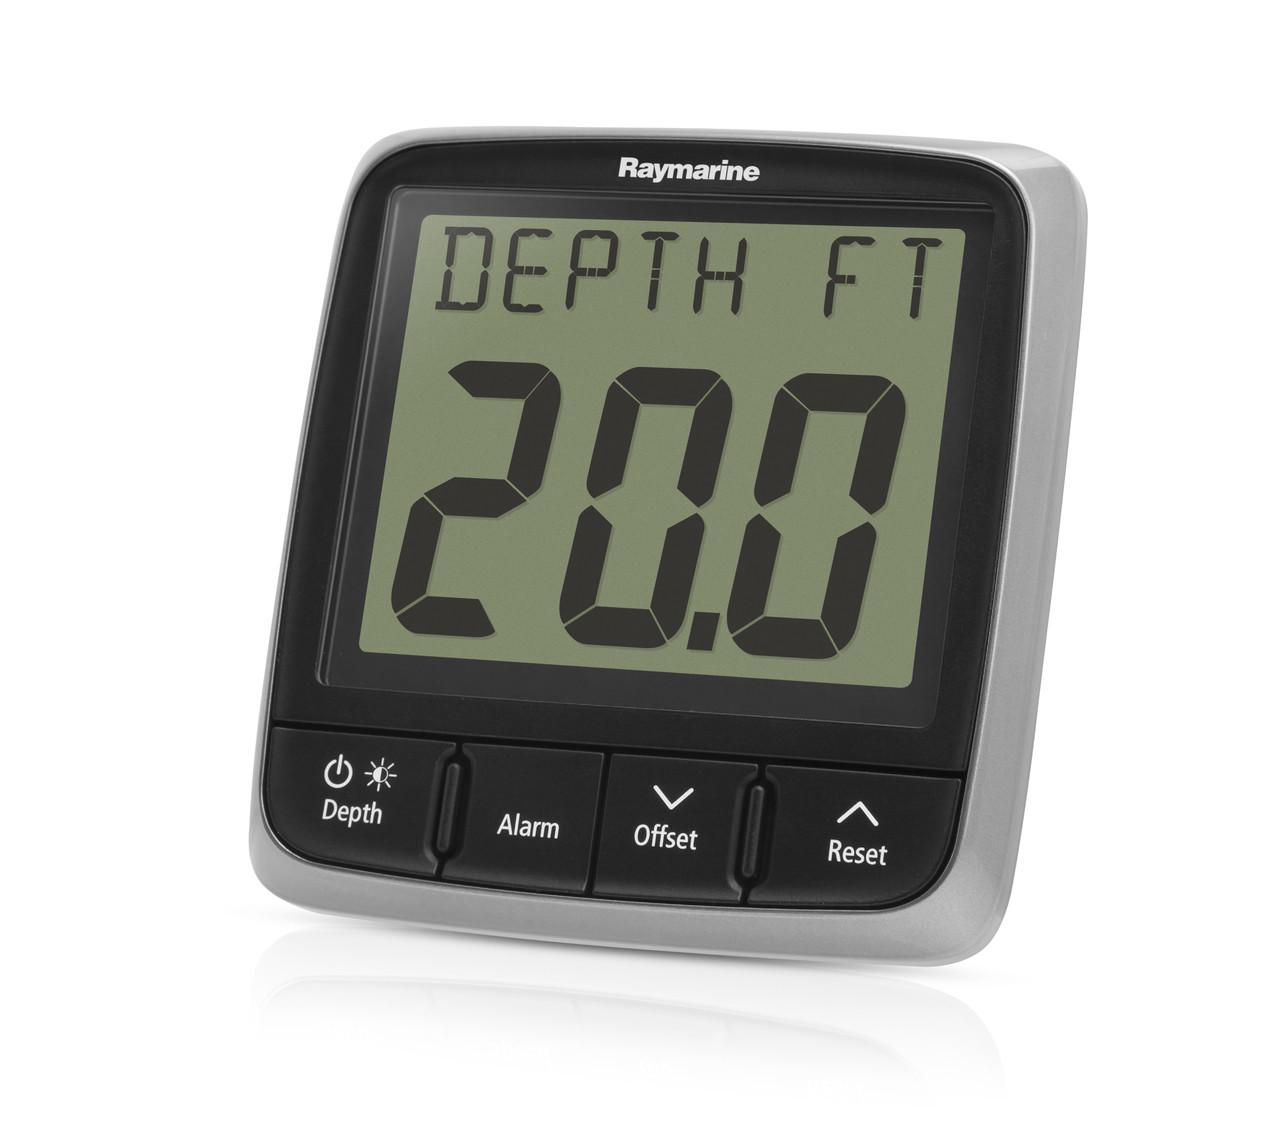 Raymarine i50 Depth Instrument Display Right View